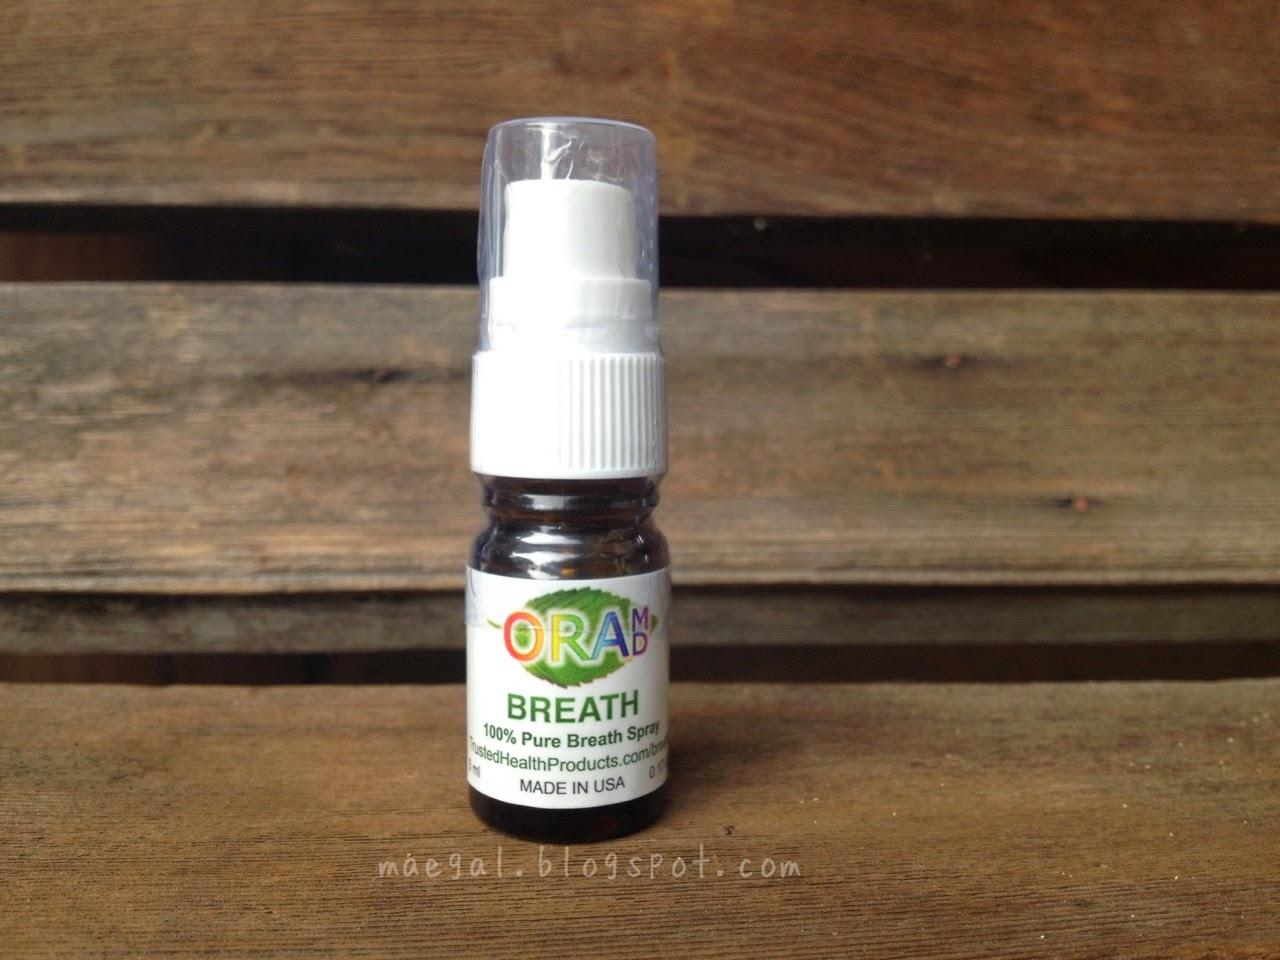 OraMD Breath Spray Bottle | maegal.blogspot.com